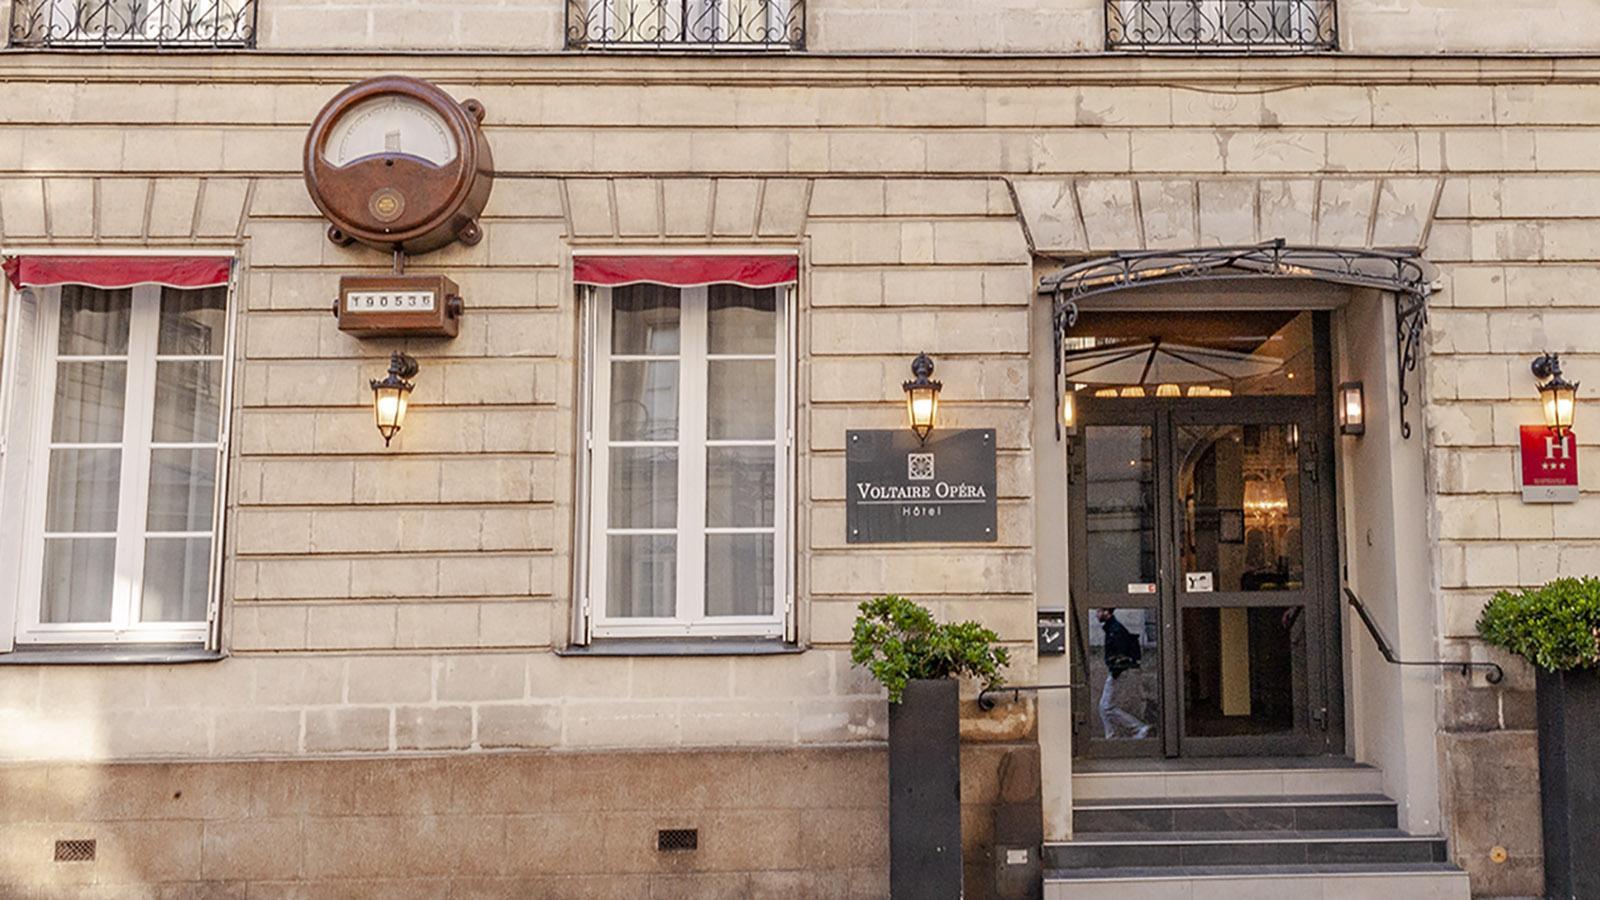 Nantes: Hôtel Voltaire Opéra. Foto: Hilke Maunder